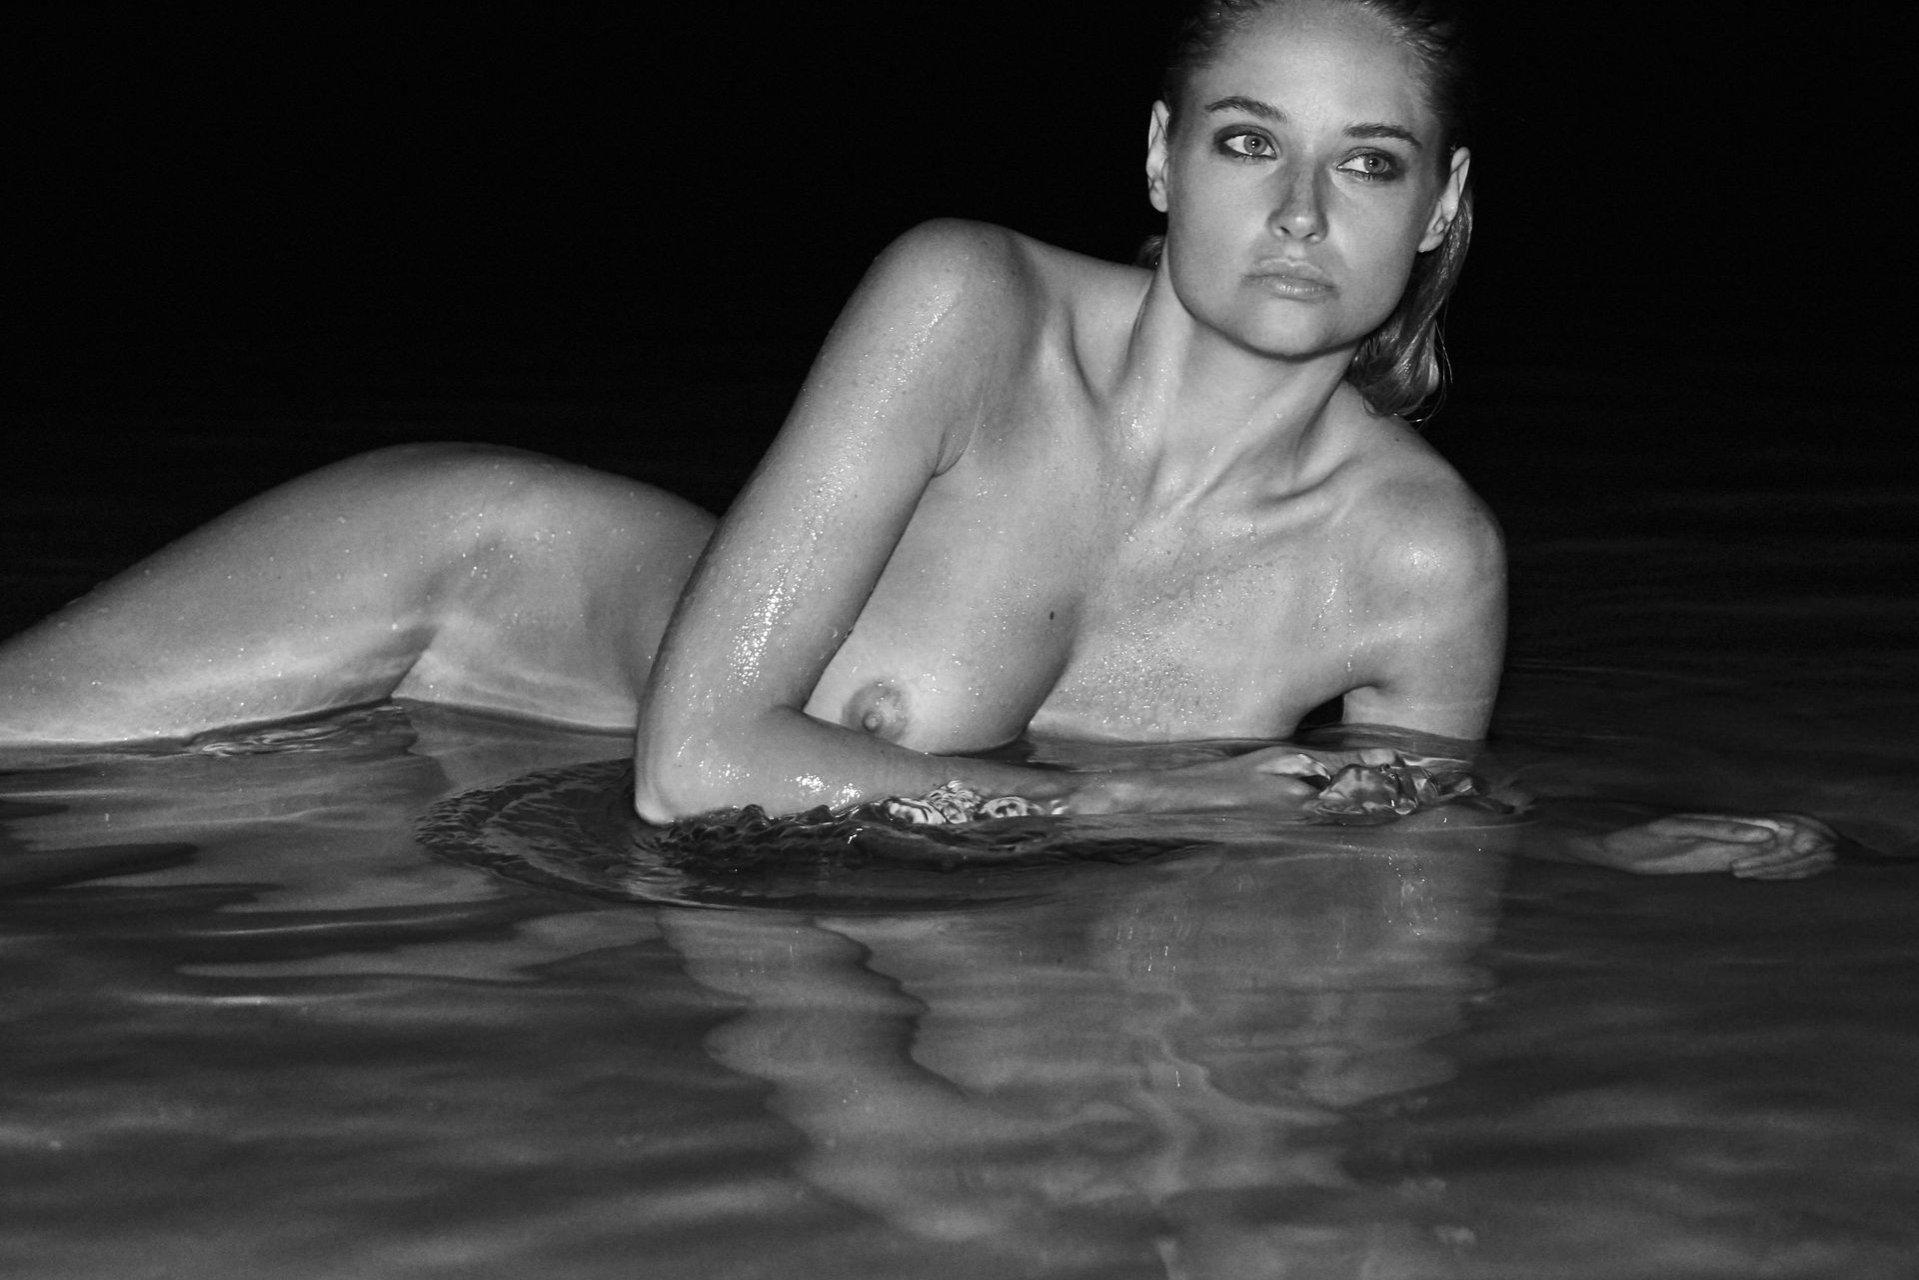 Genevieve guzchack nude